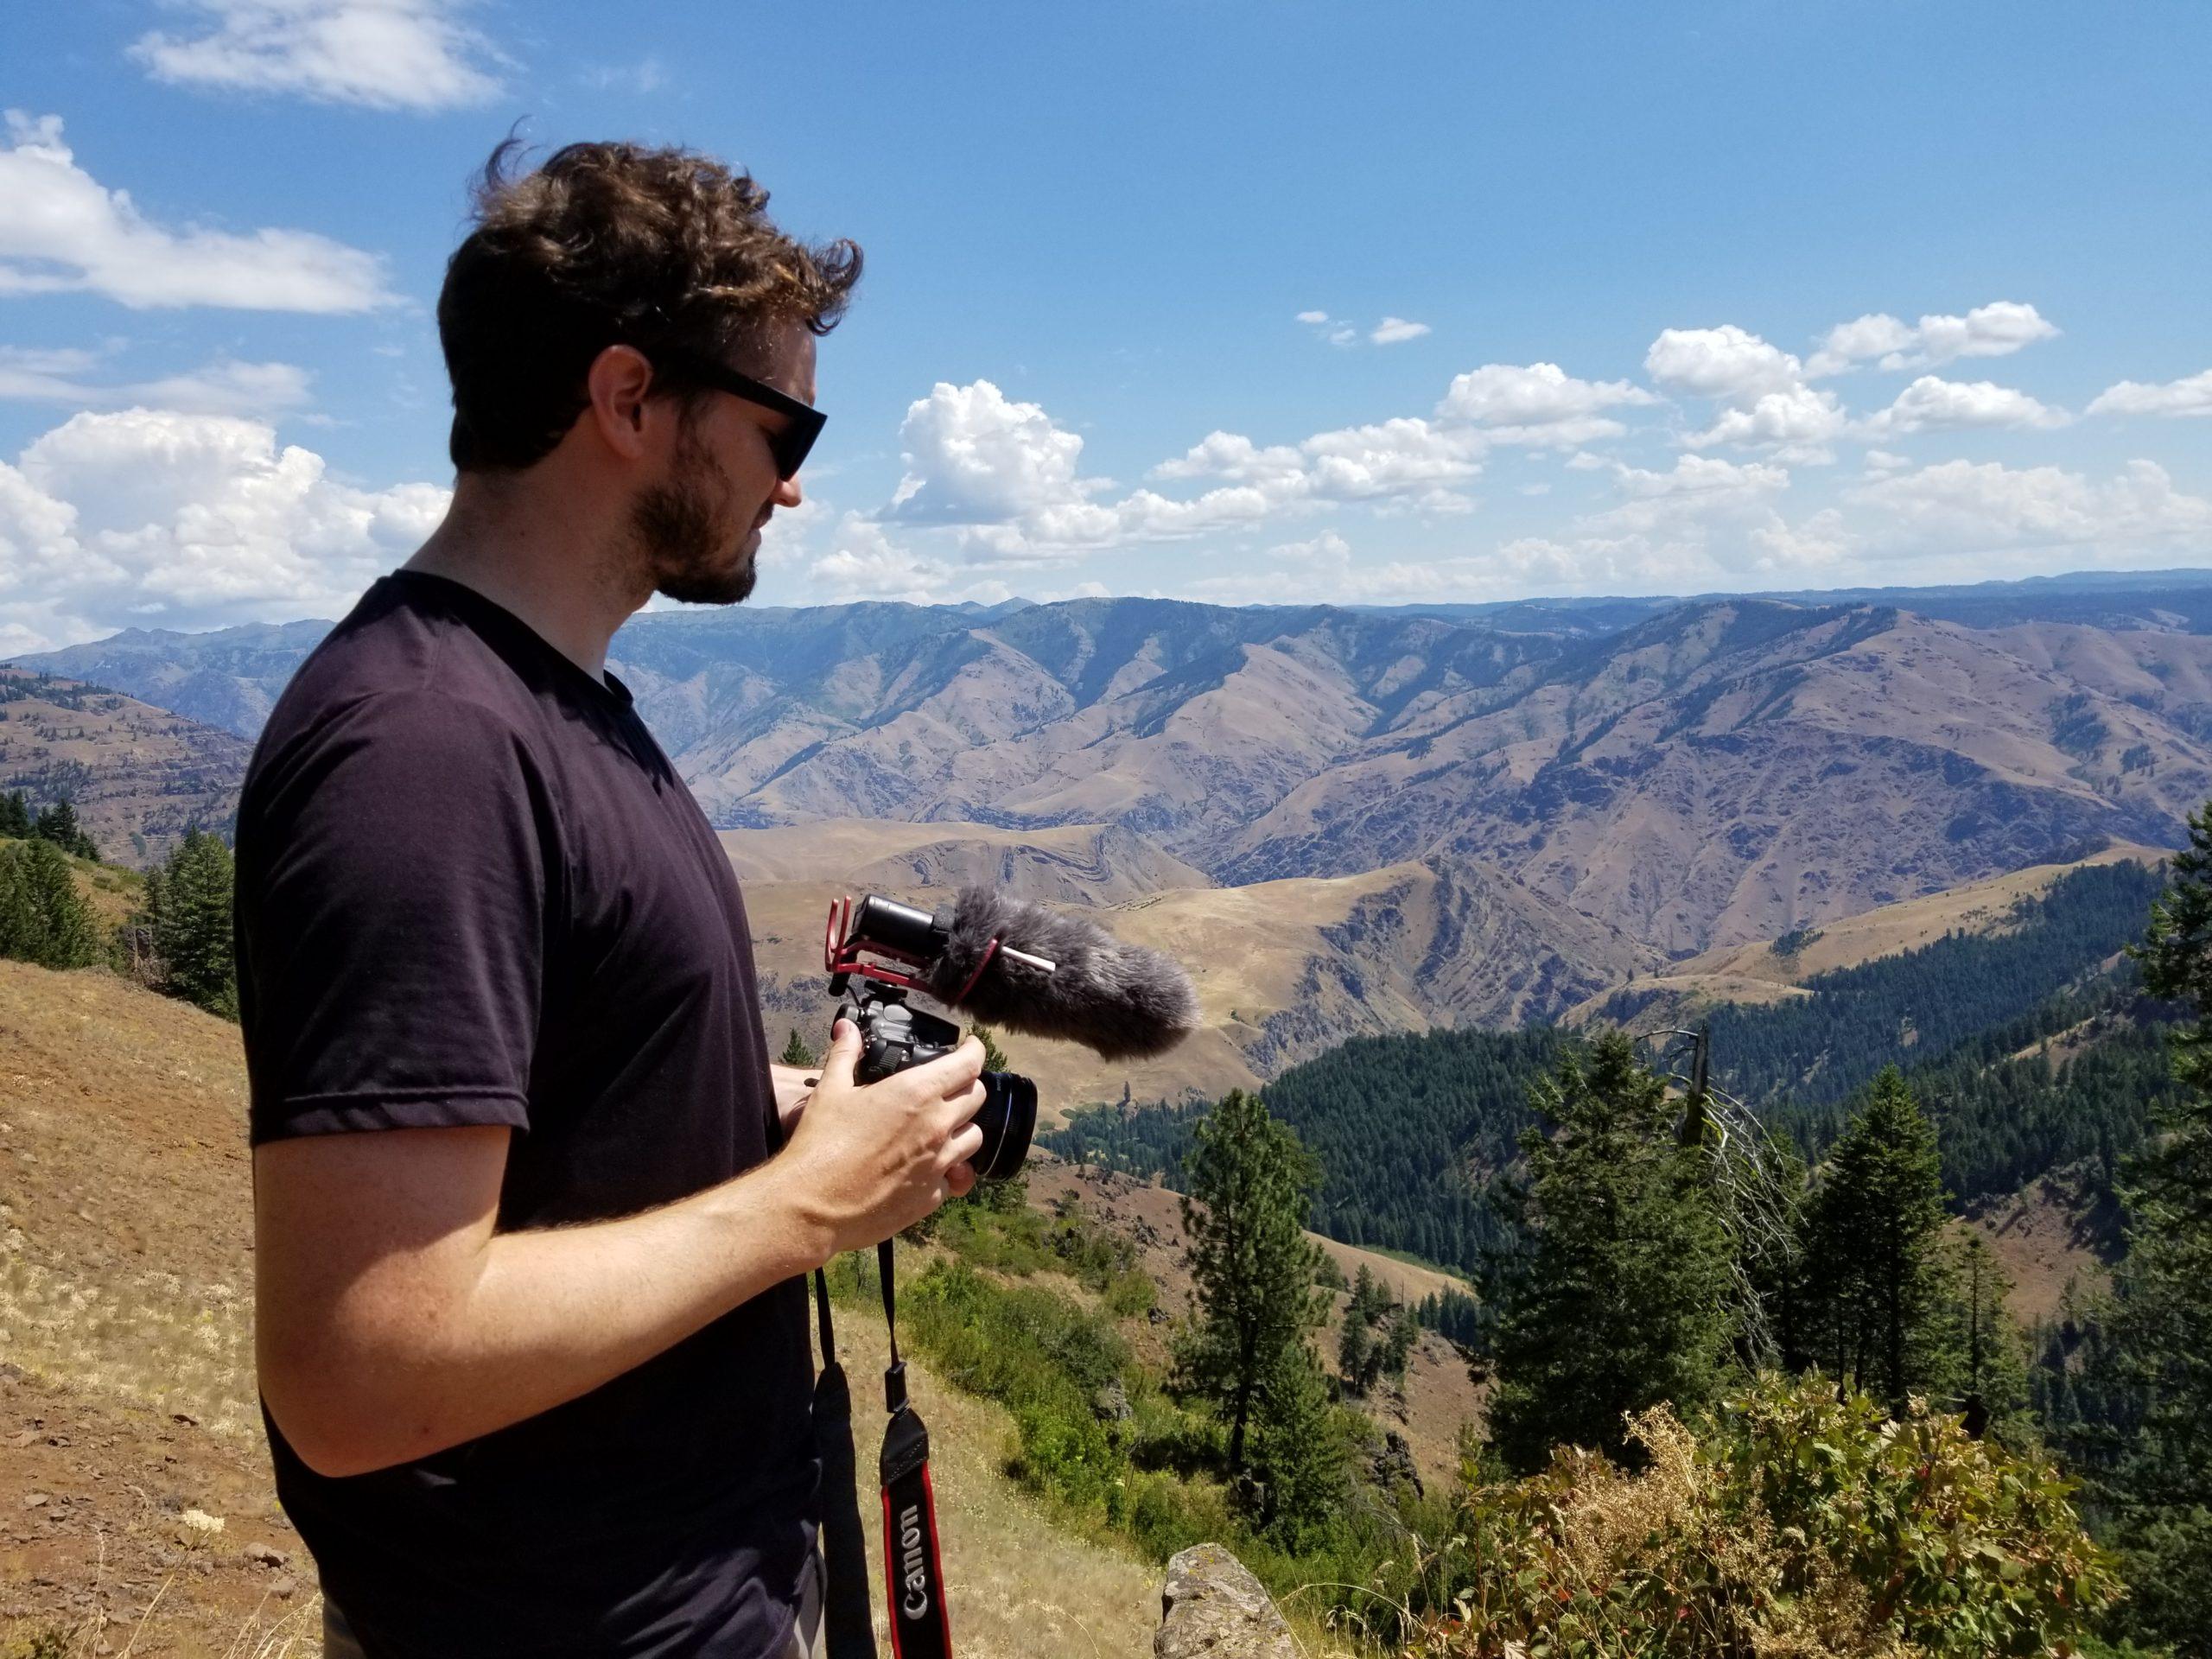 Matt Cook Oregon Videos On Hiking, Wilderness, Exploration